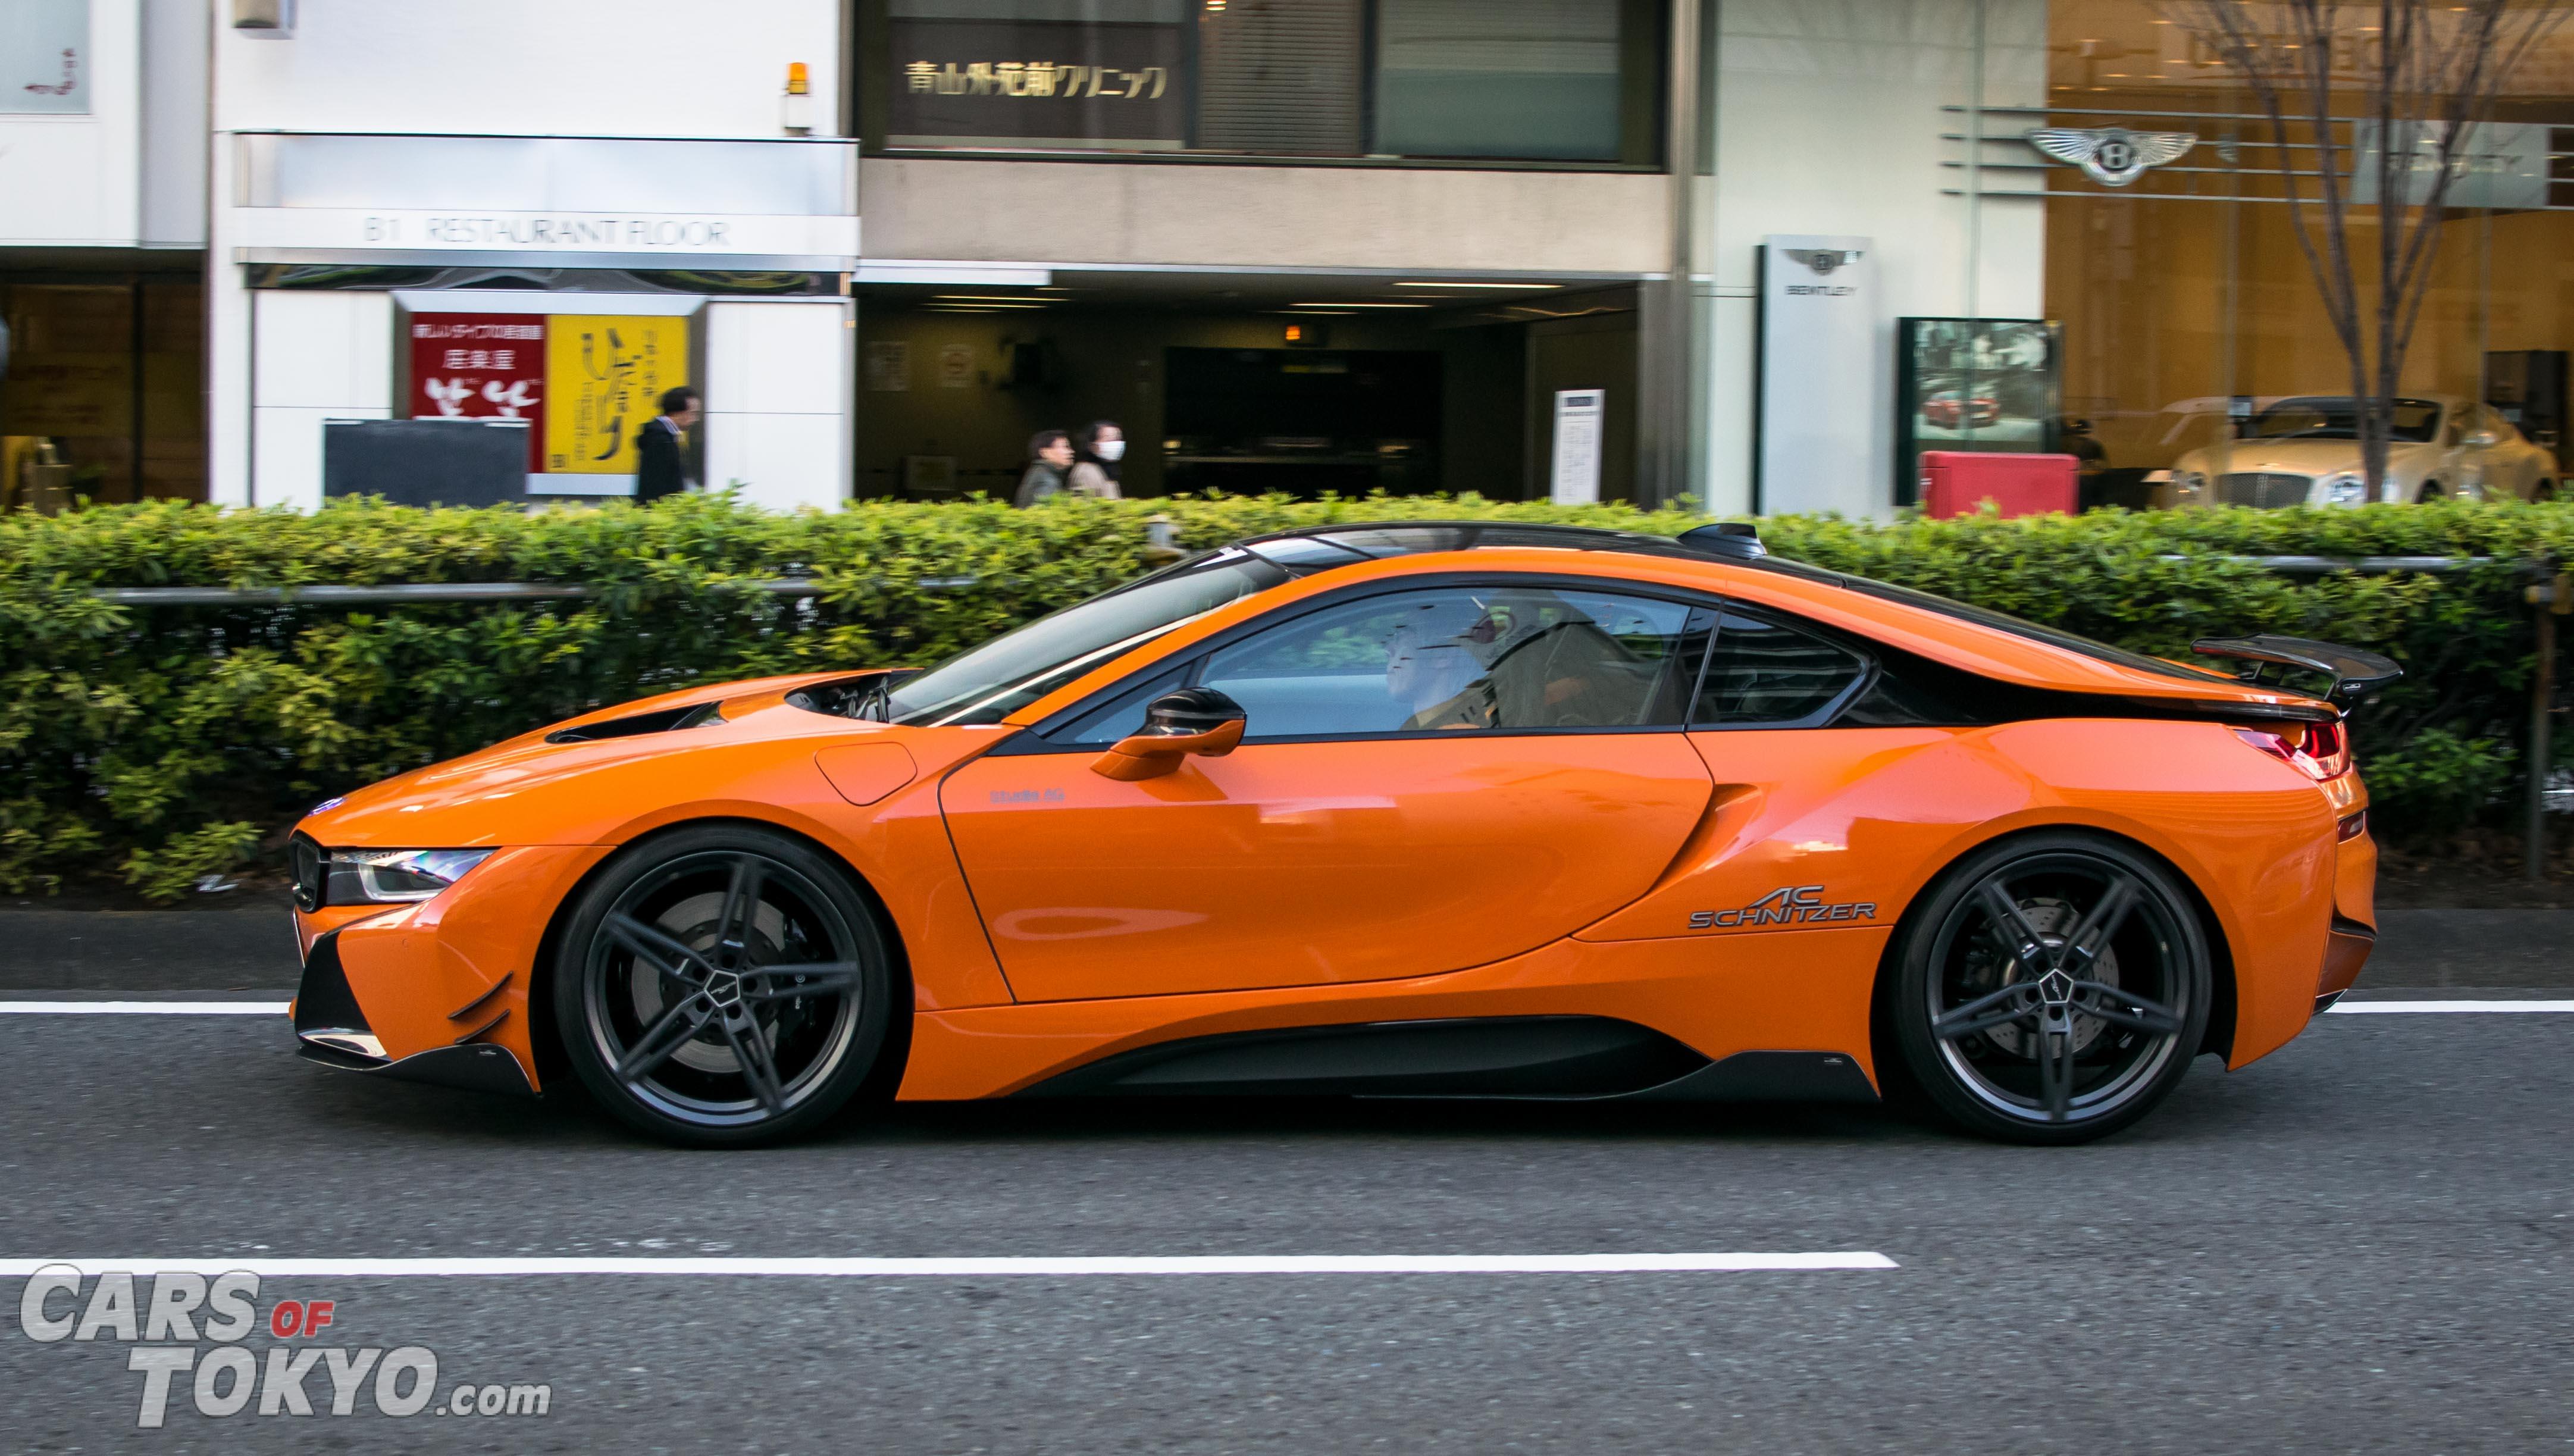 Aoyama Bmw I8 Ac Schnitzer Cars Of Tokyo